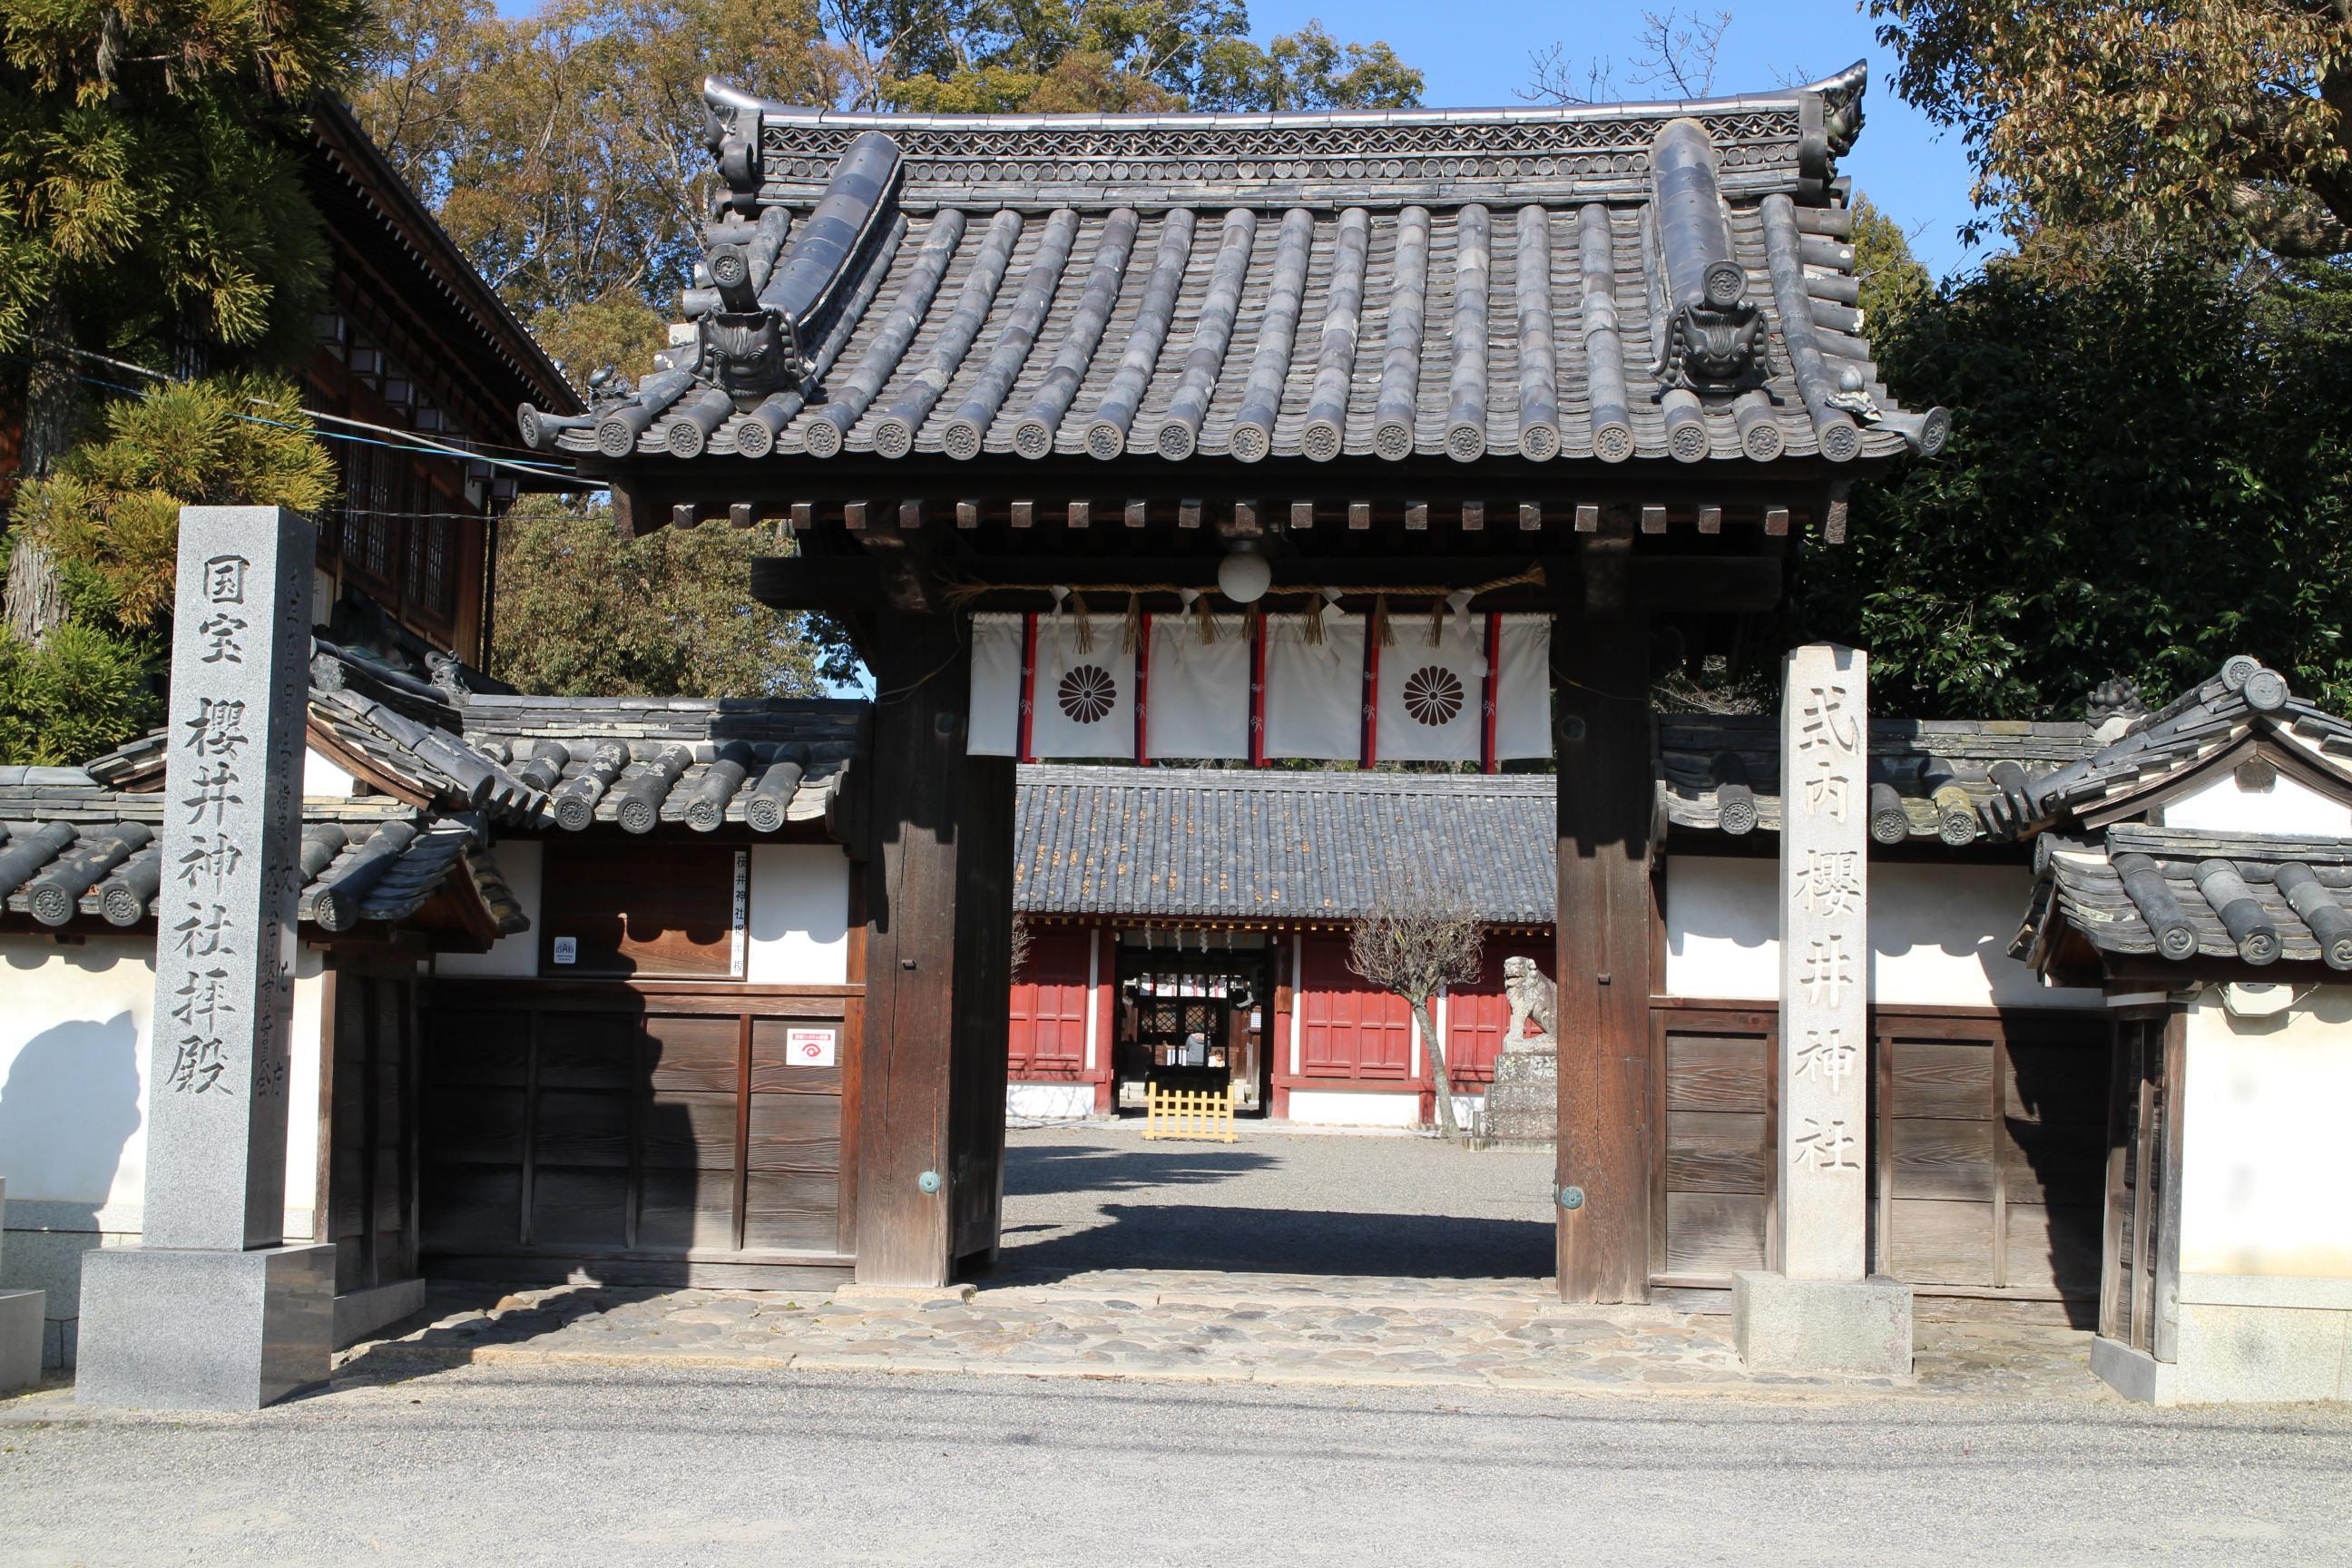 櫻井神社の山門